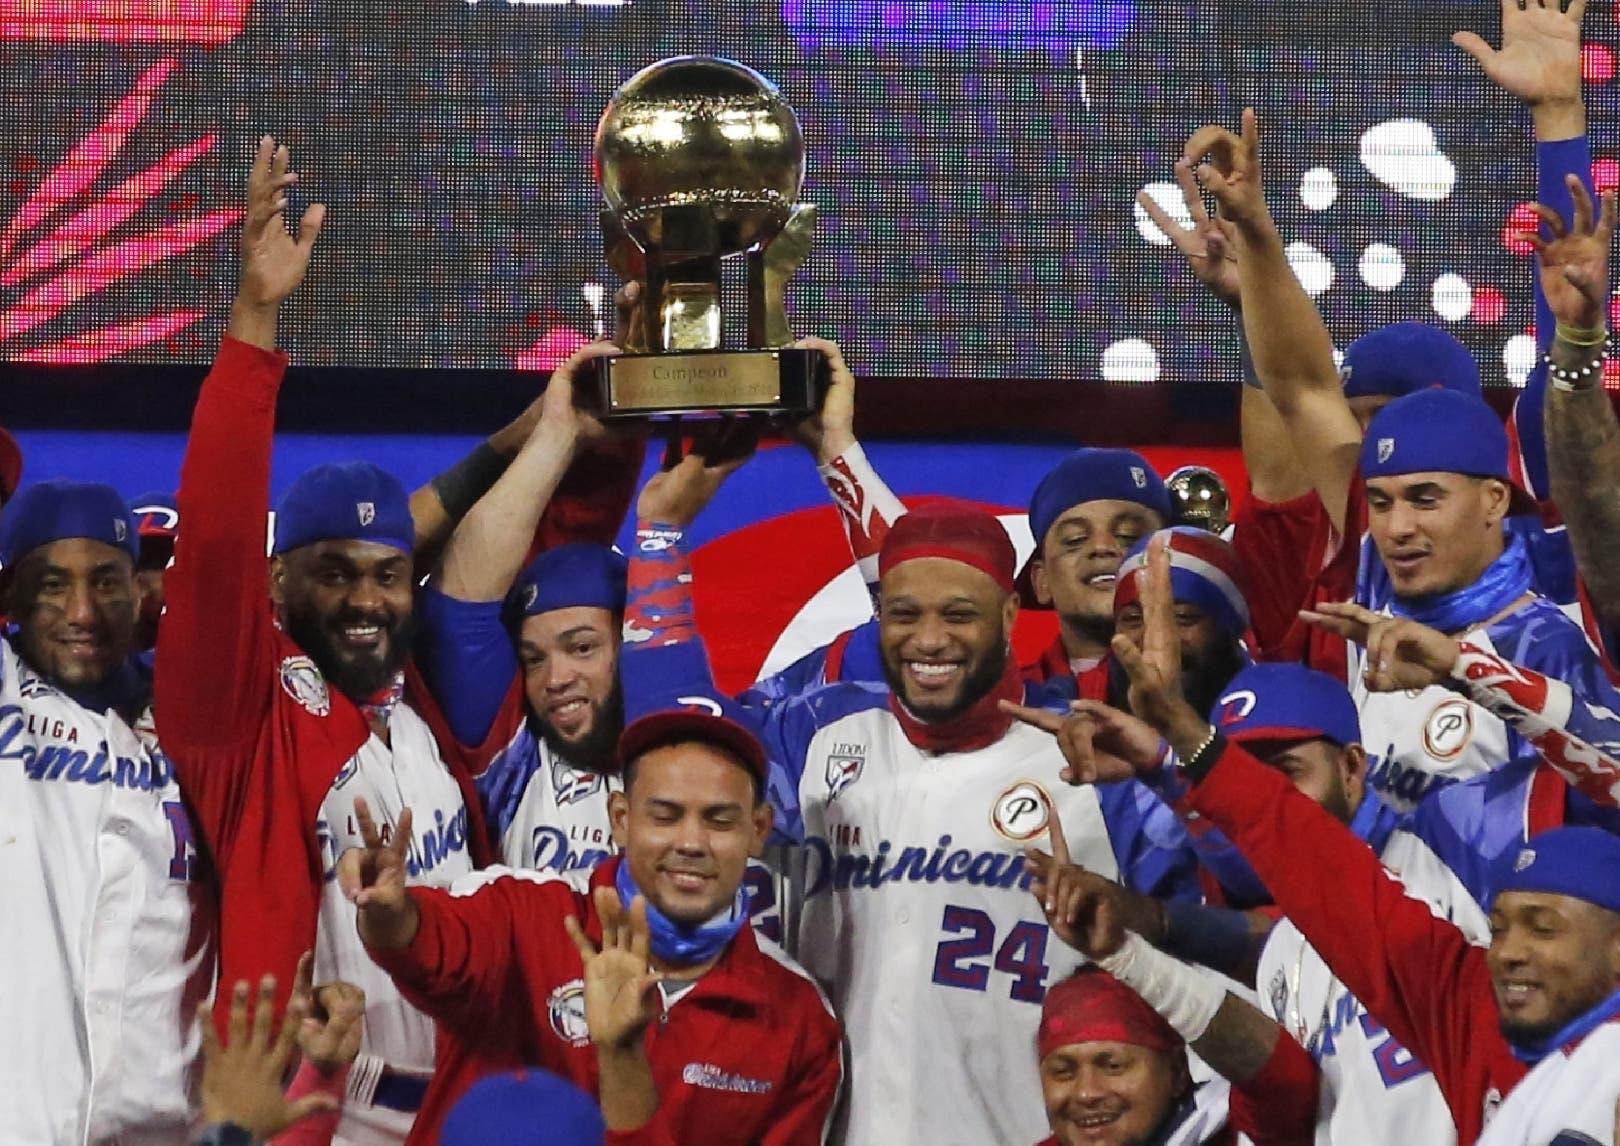 RD impuso superioridad para ganar Serie Caribe